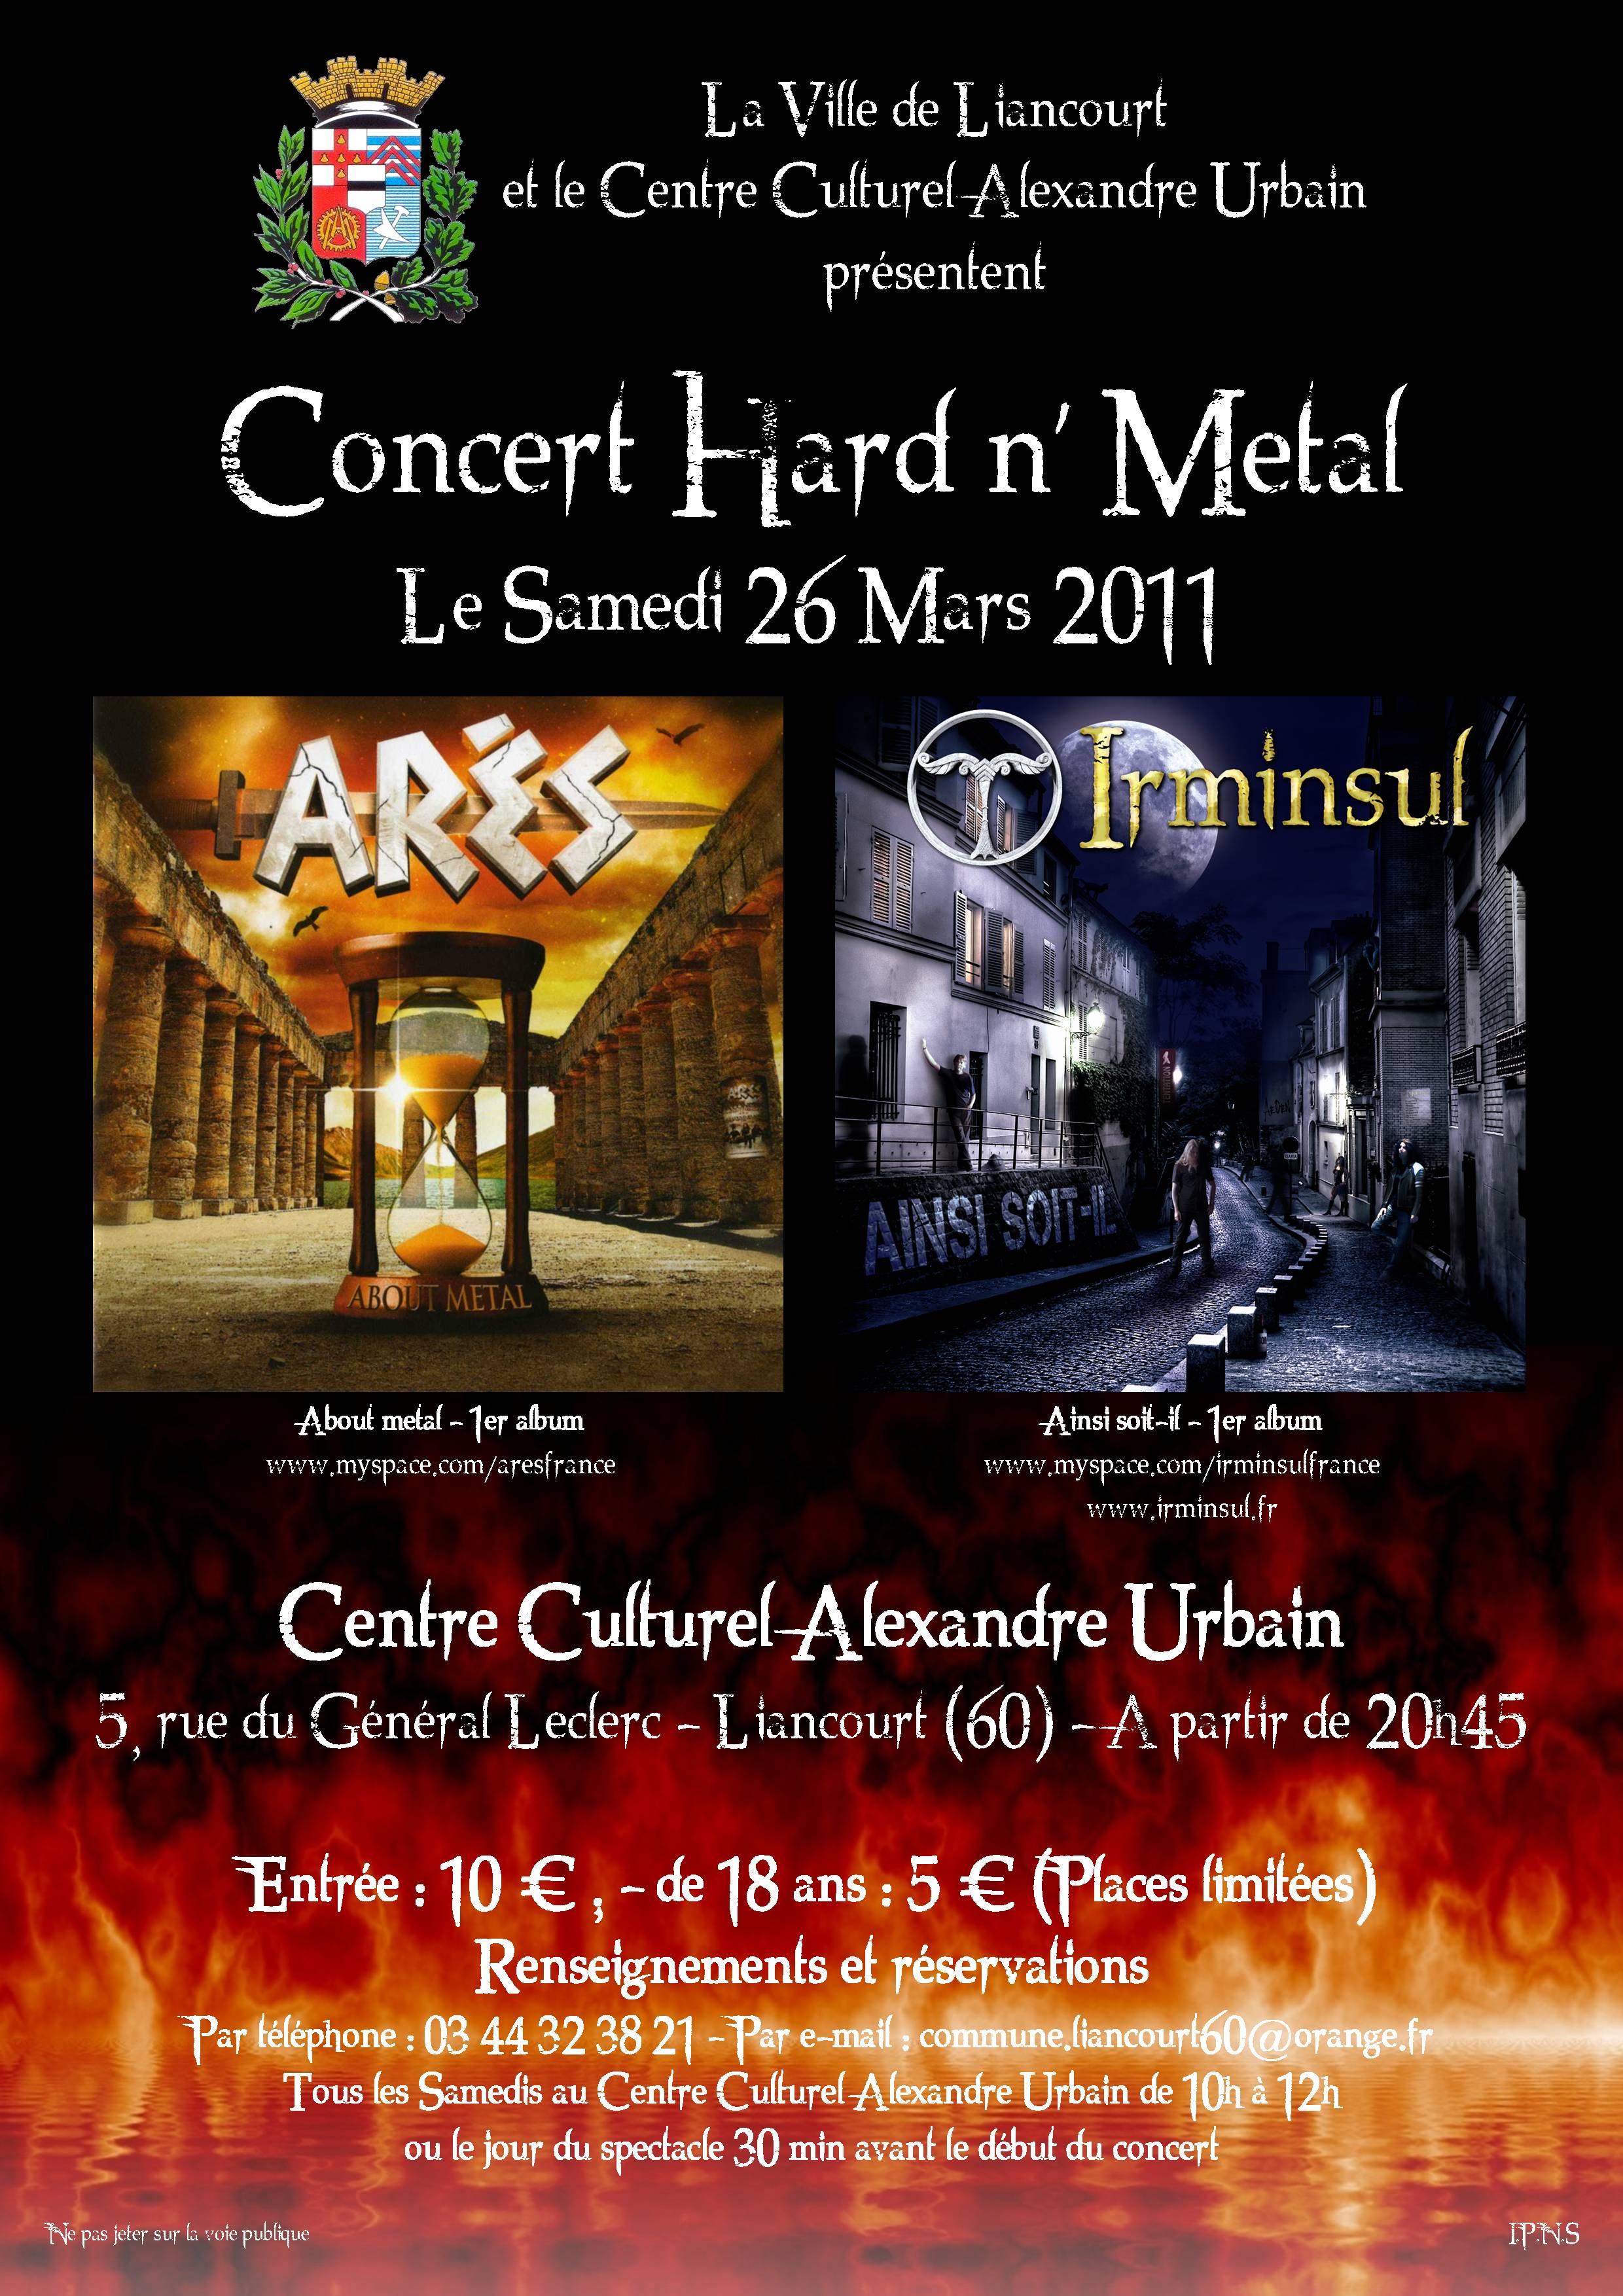 Centre Culturel Alexandre Urbain 2011 (1)